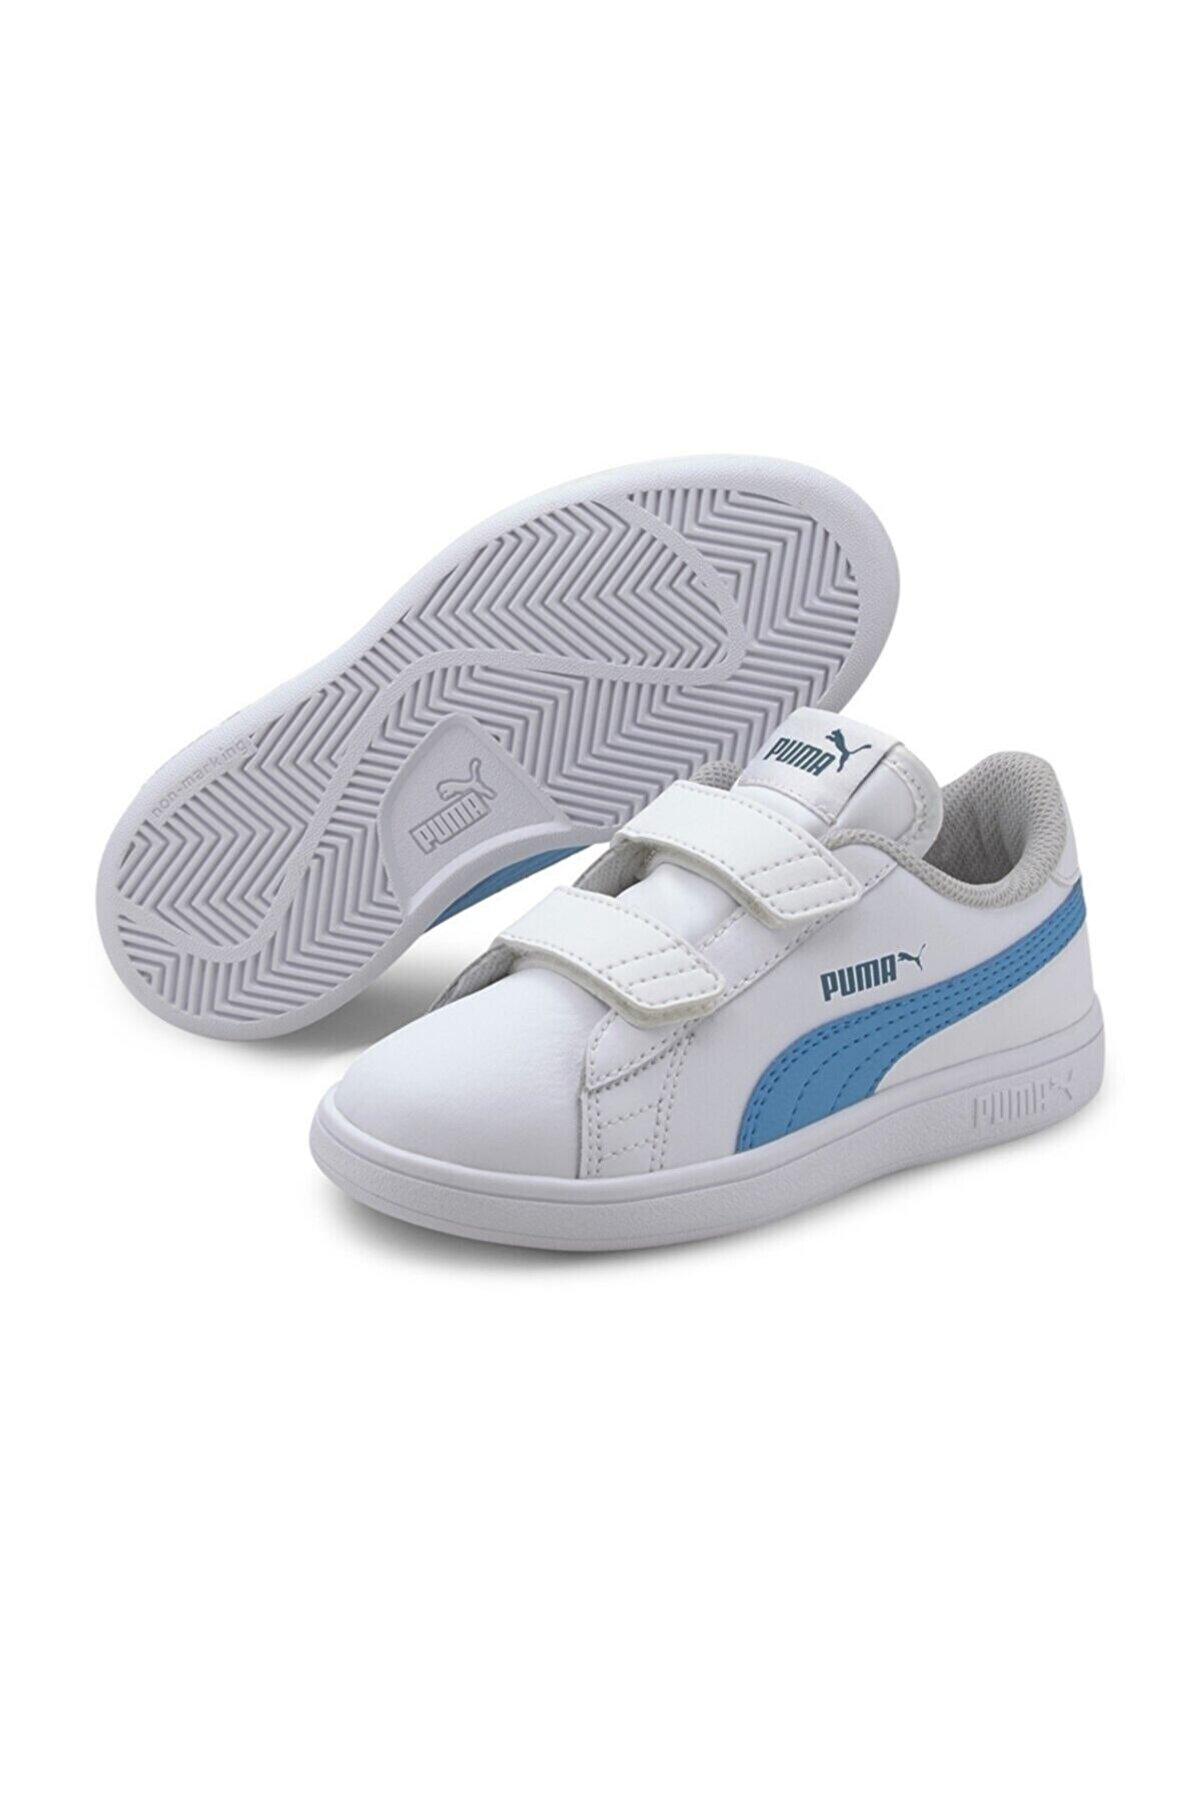 Puma SMASH V2 L V PS Beyaz Erkek Çocuk Sneaker Ayakkabı 101119213